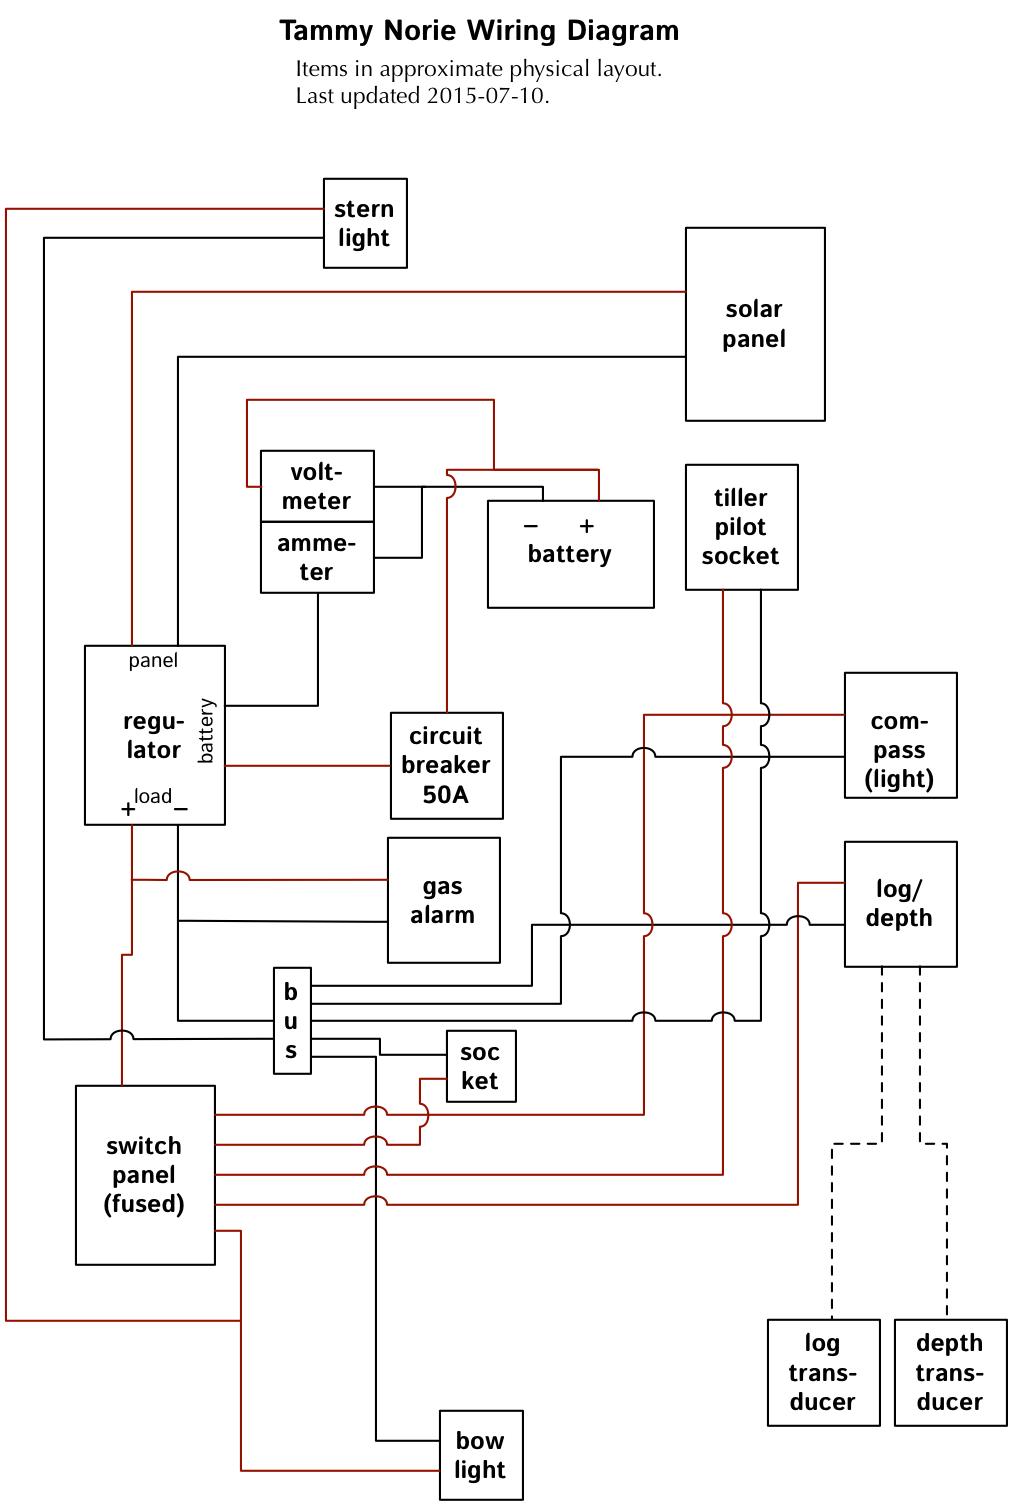 Wiring Diagram For A Standard Horizon Vhf Radio Auto Electrical Ais